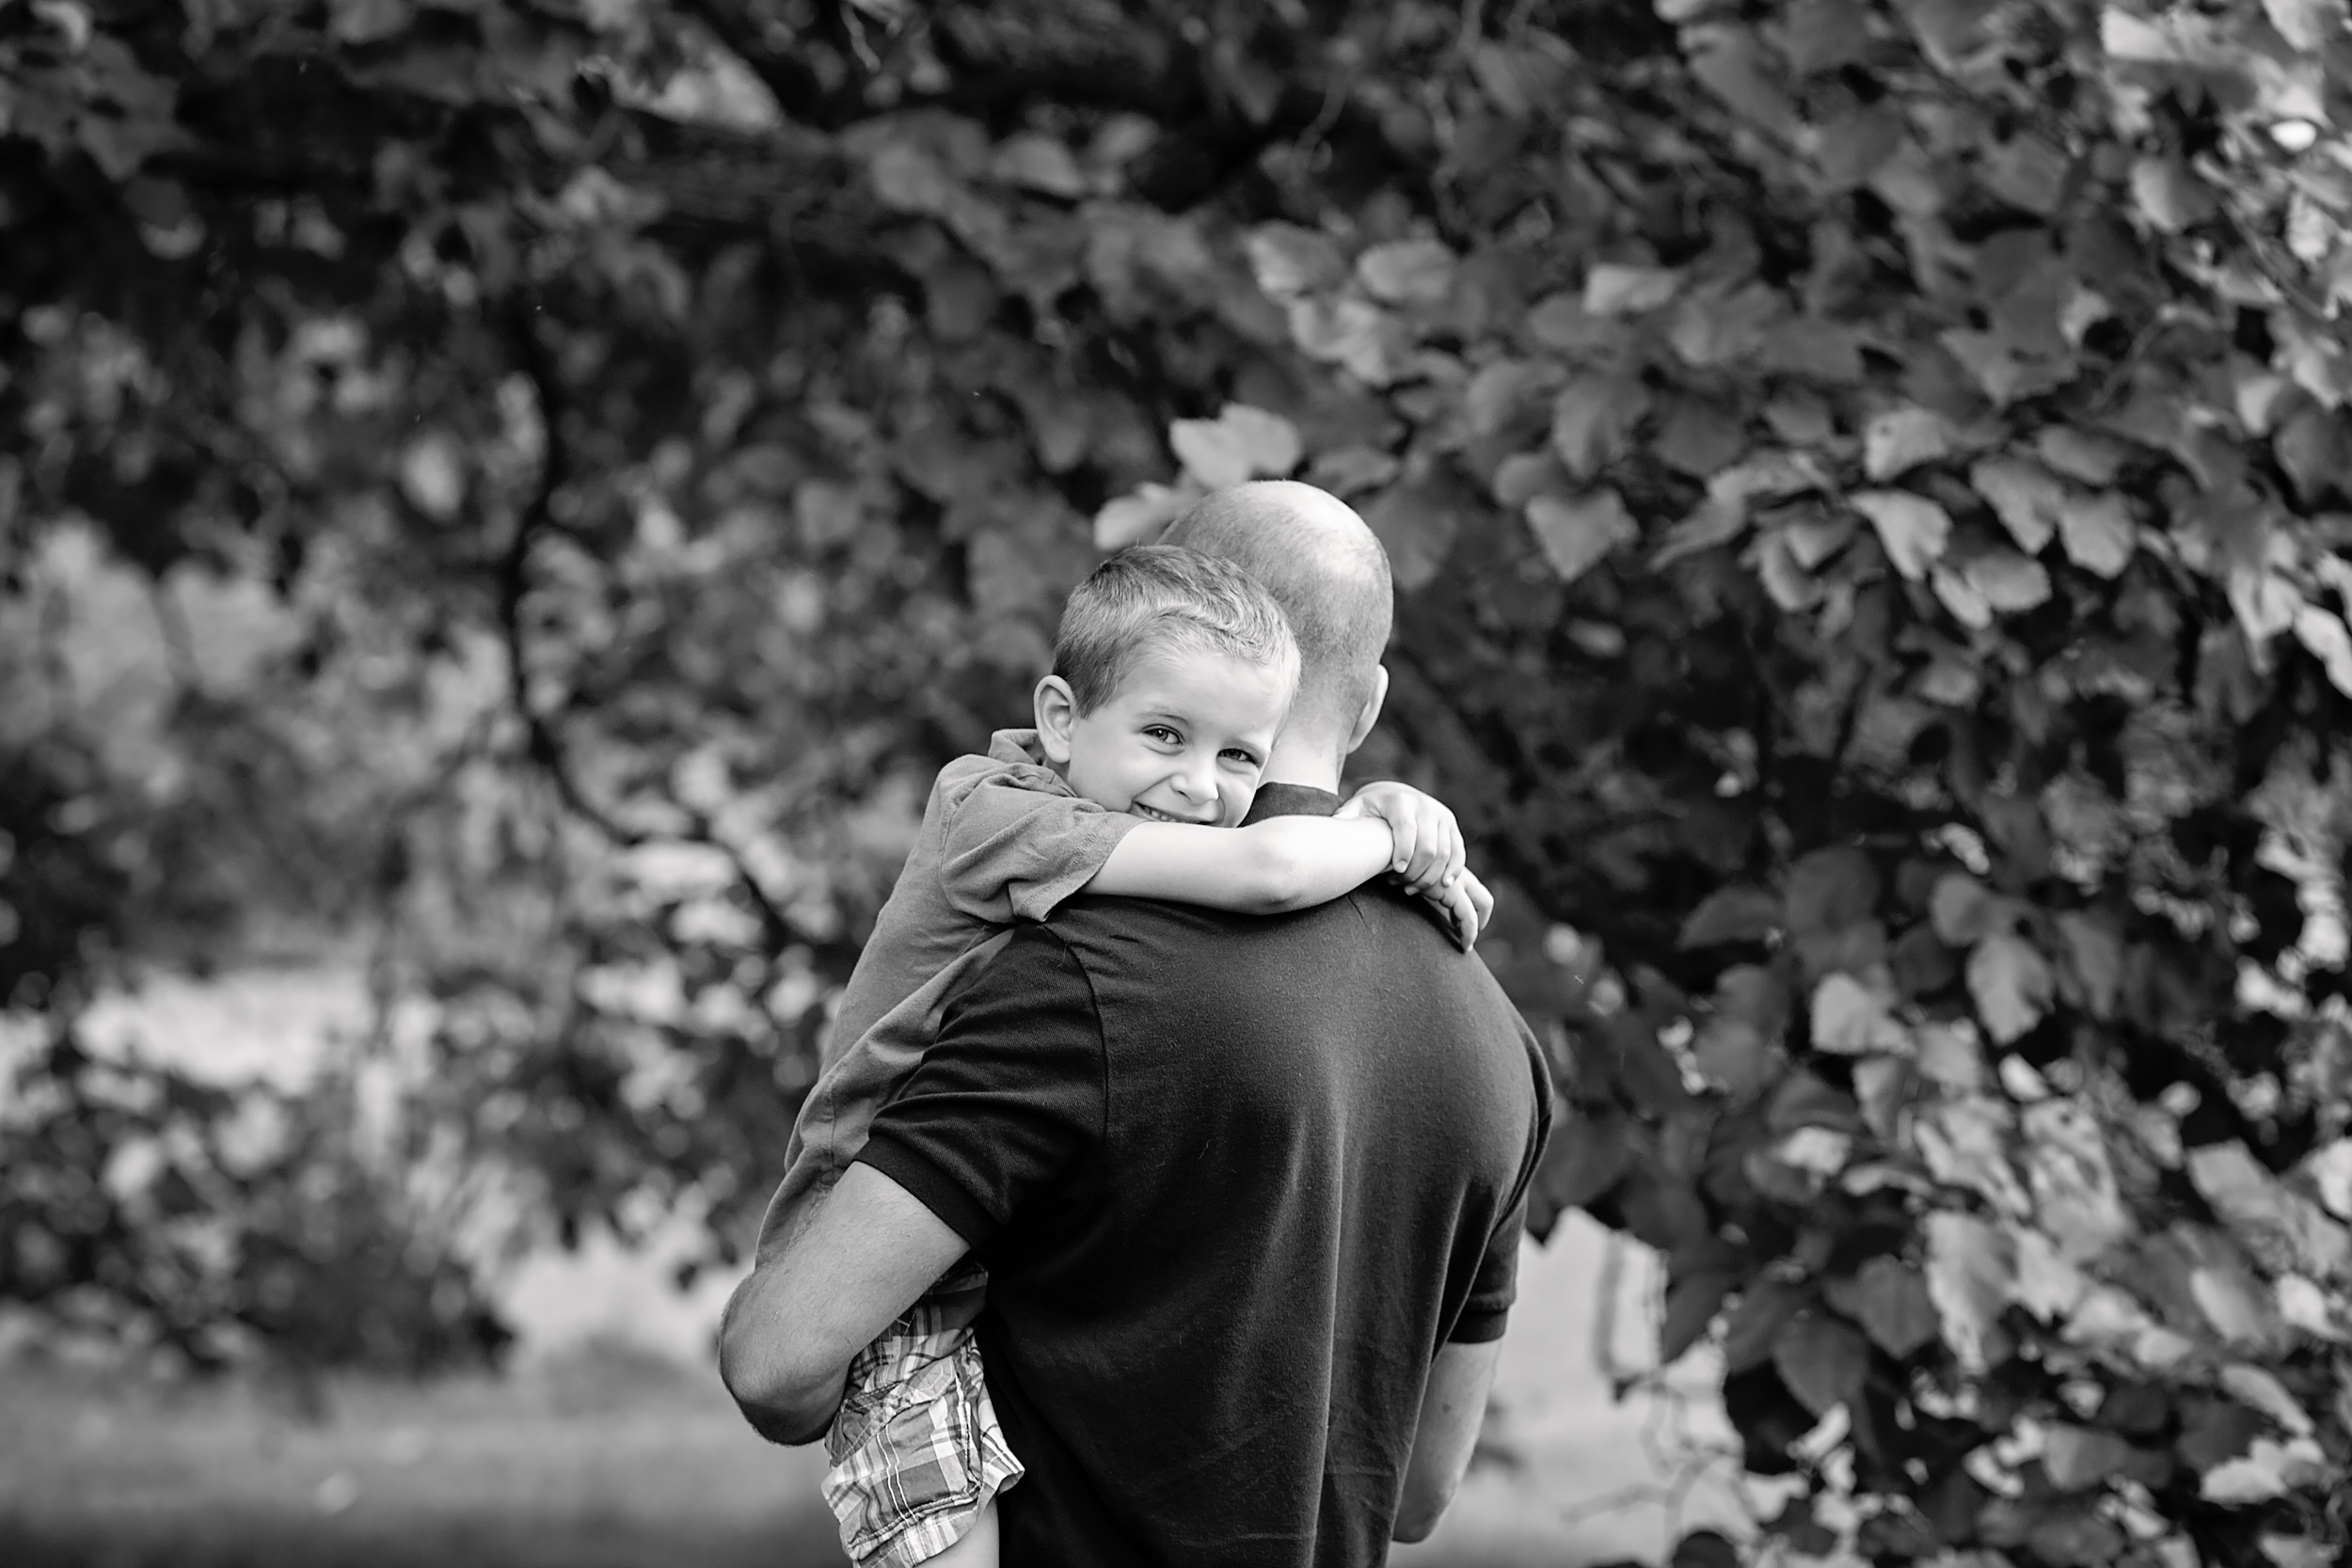 Quad Cities Family Photographer   Miriam Bulcher Photography    www.miriambulcher.com